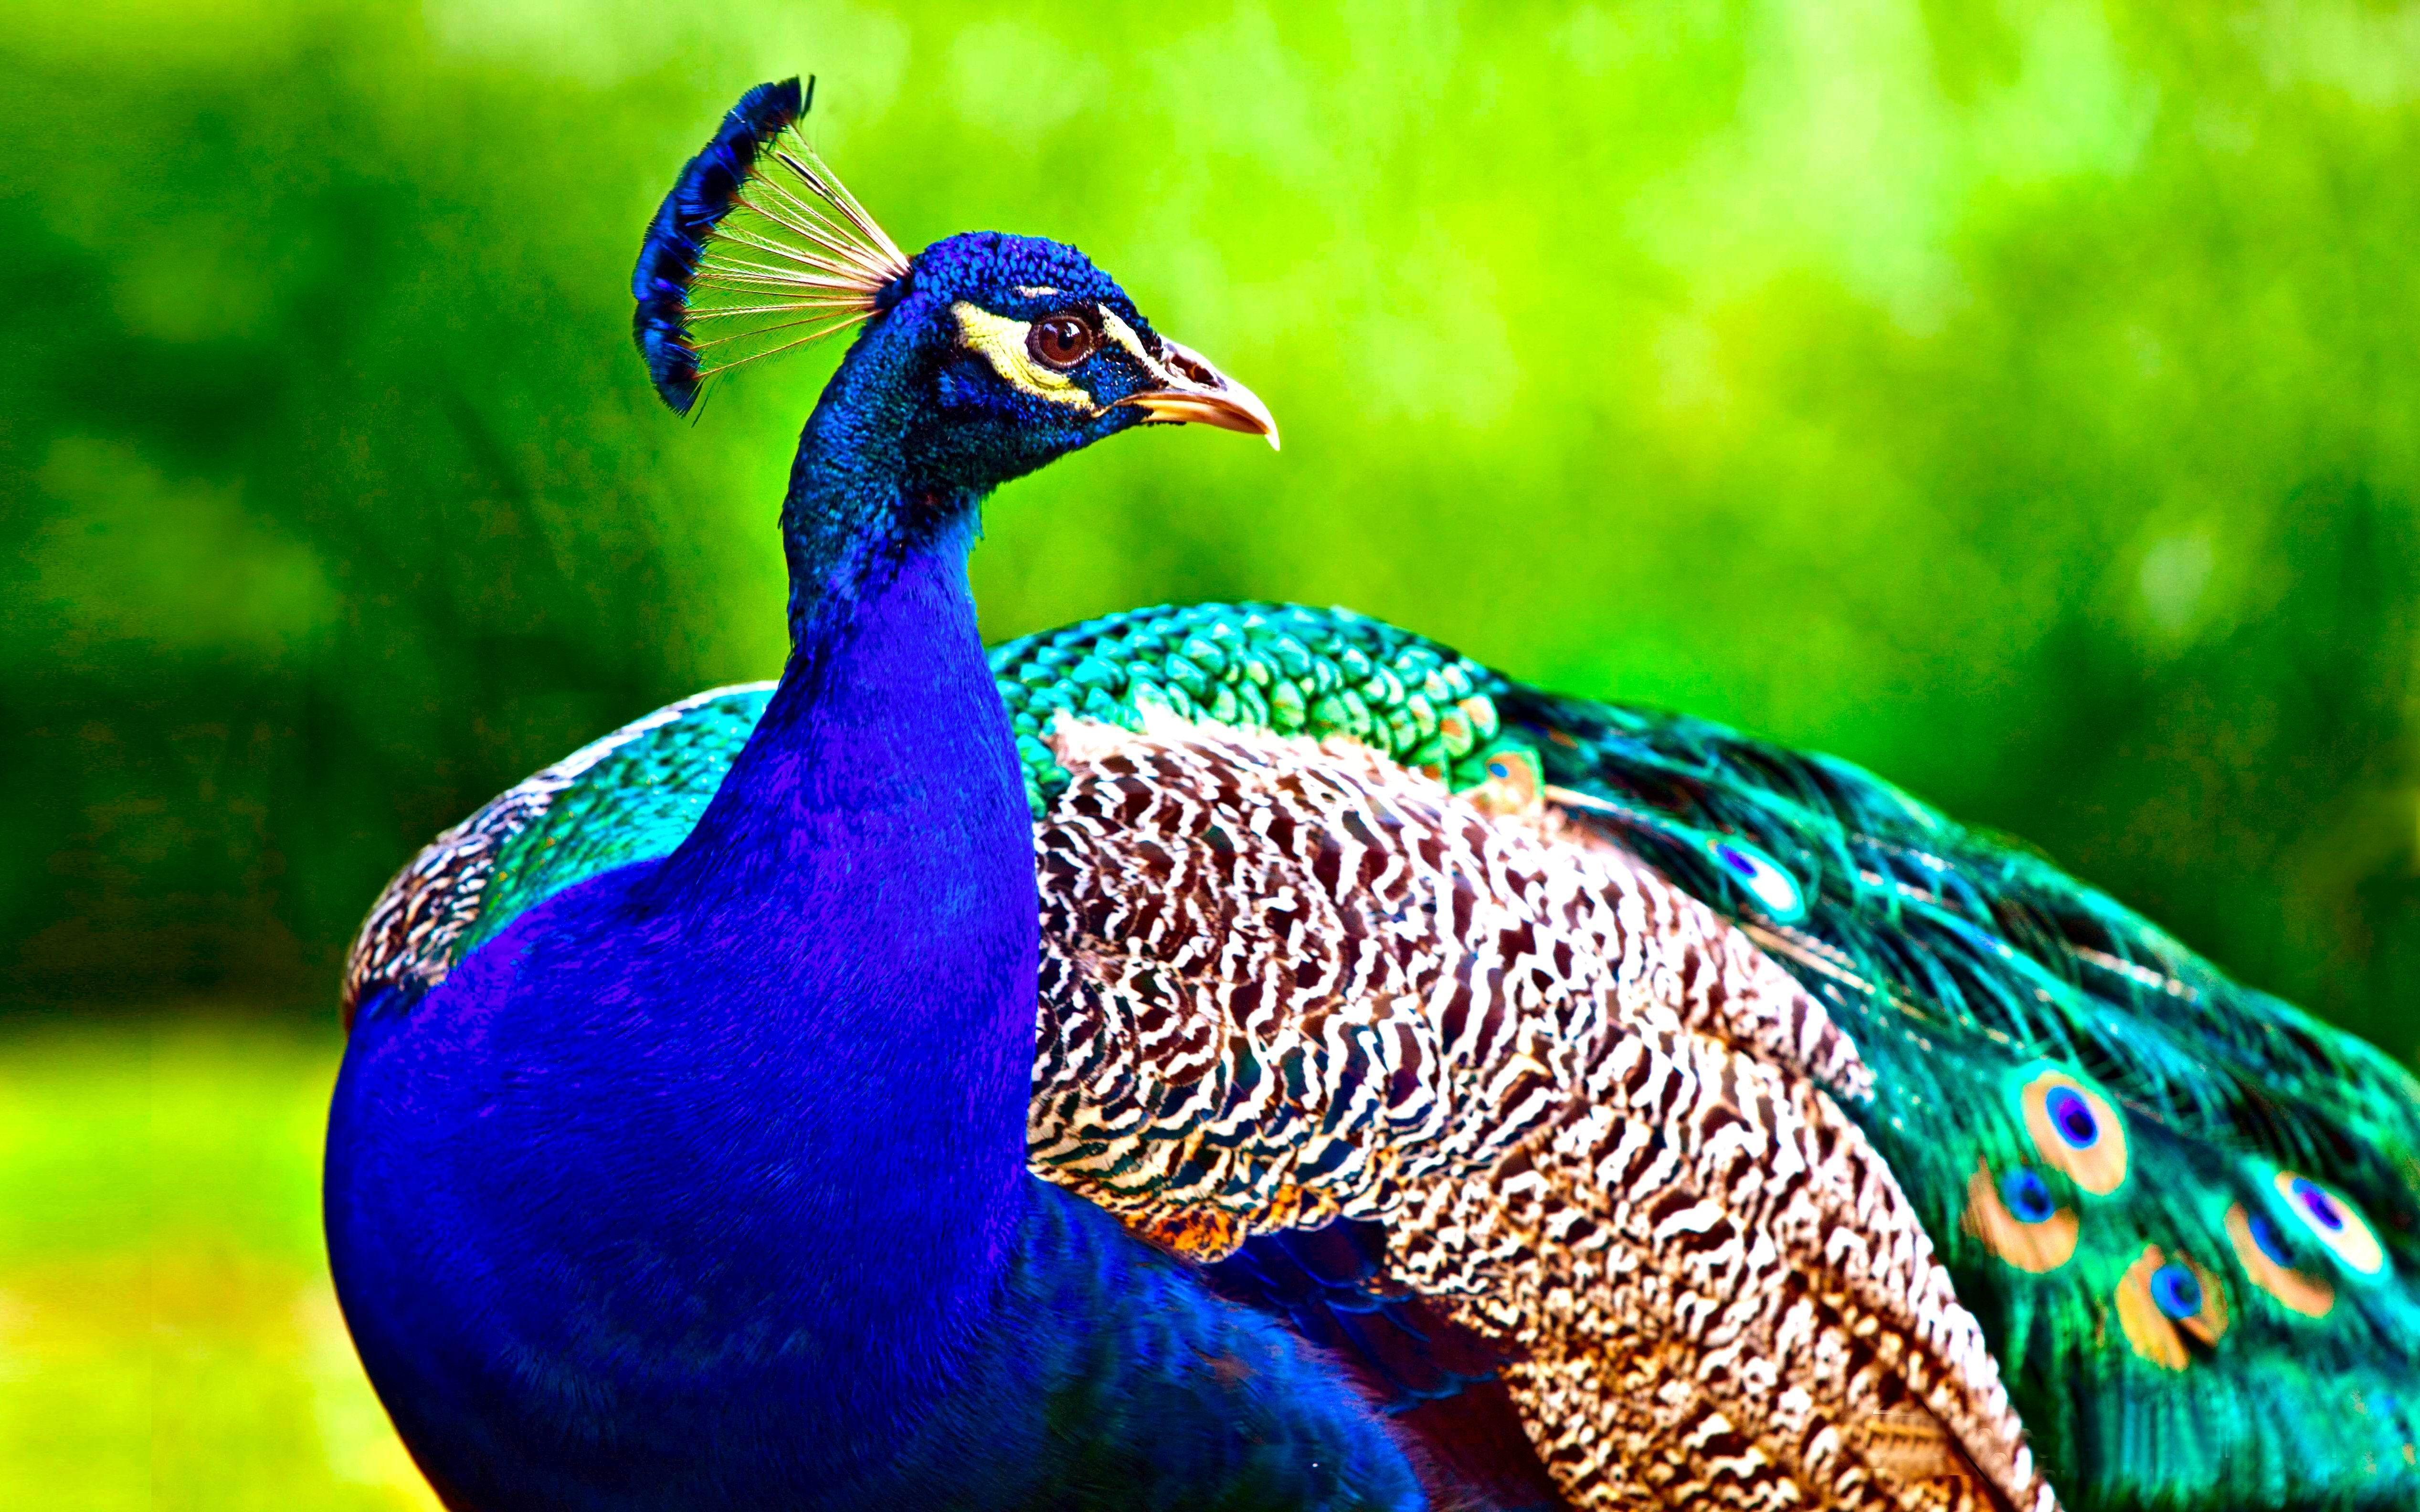 Peacock Pics To Color Wallpaper Peacock Wallpaper Peacock Pictures Peacock